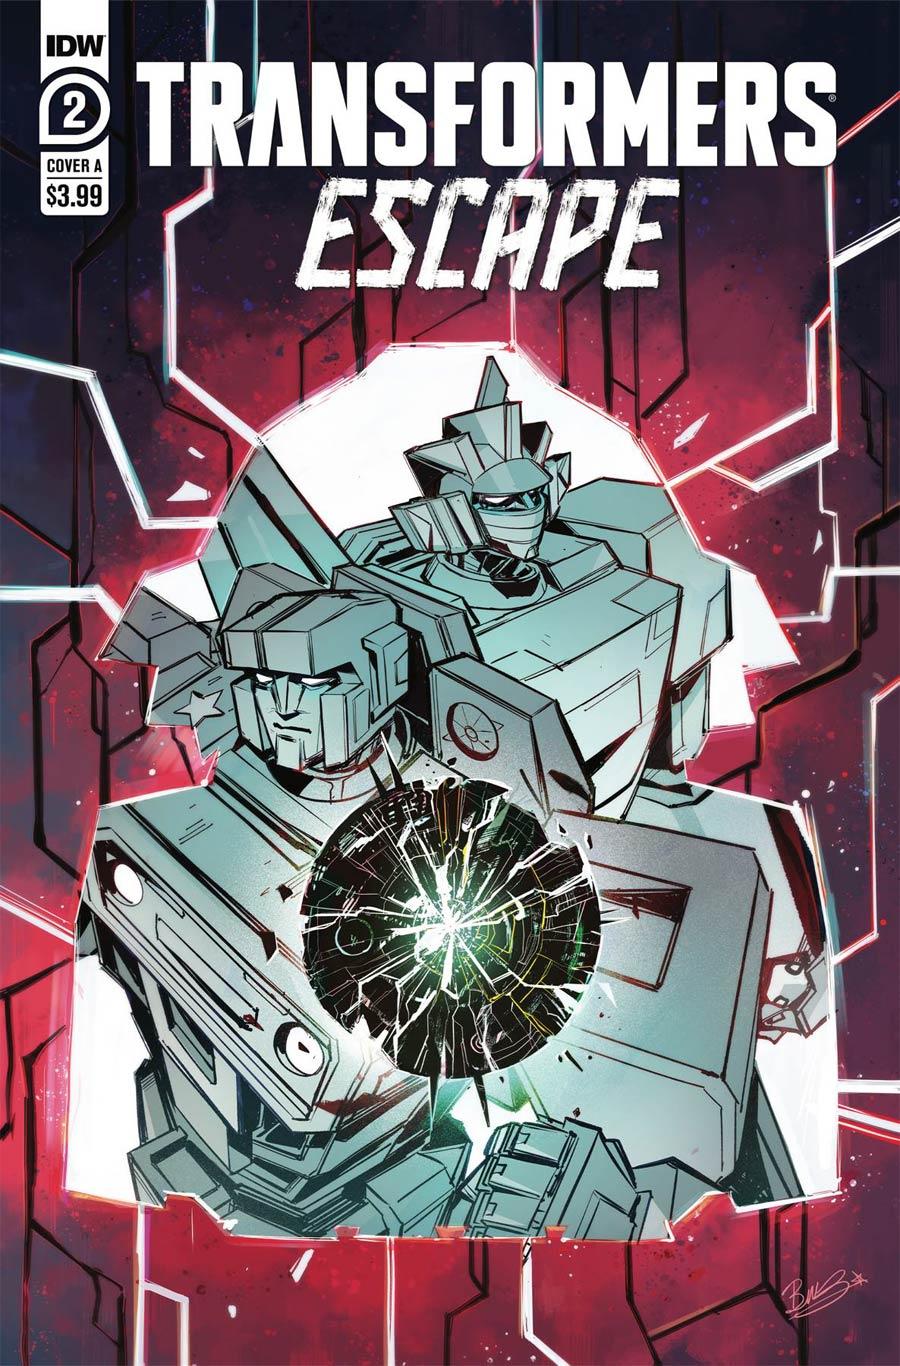 Transformers Escape #2 Cover A Regular Beth McGuire-Smith Cover